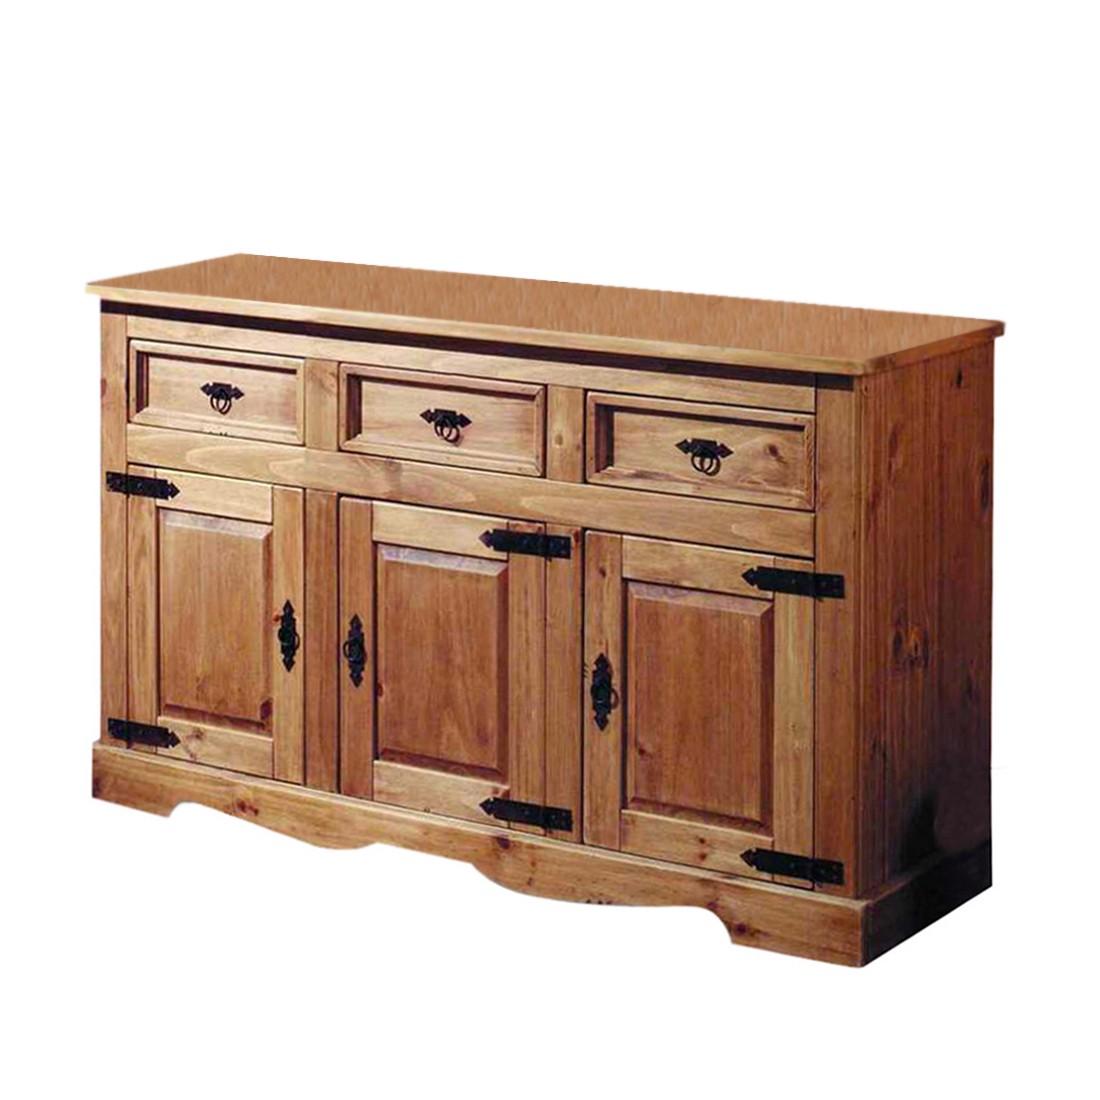 sideboard zacateca iii kiefer massiv antik landhaus classic online bestellen. Black Bedroom Furniture Sets. Home Design Ideas